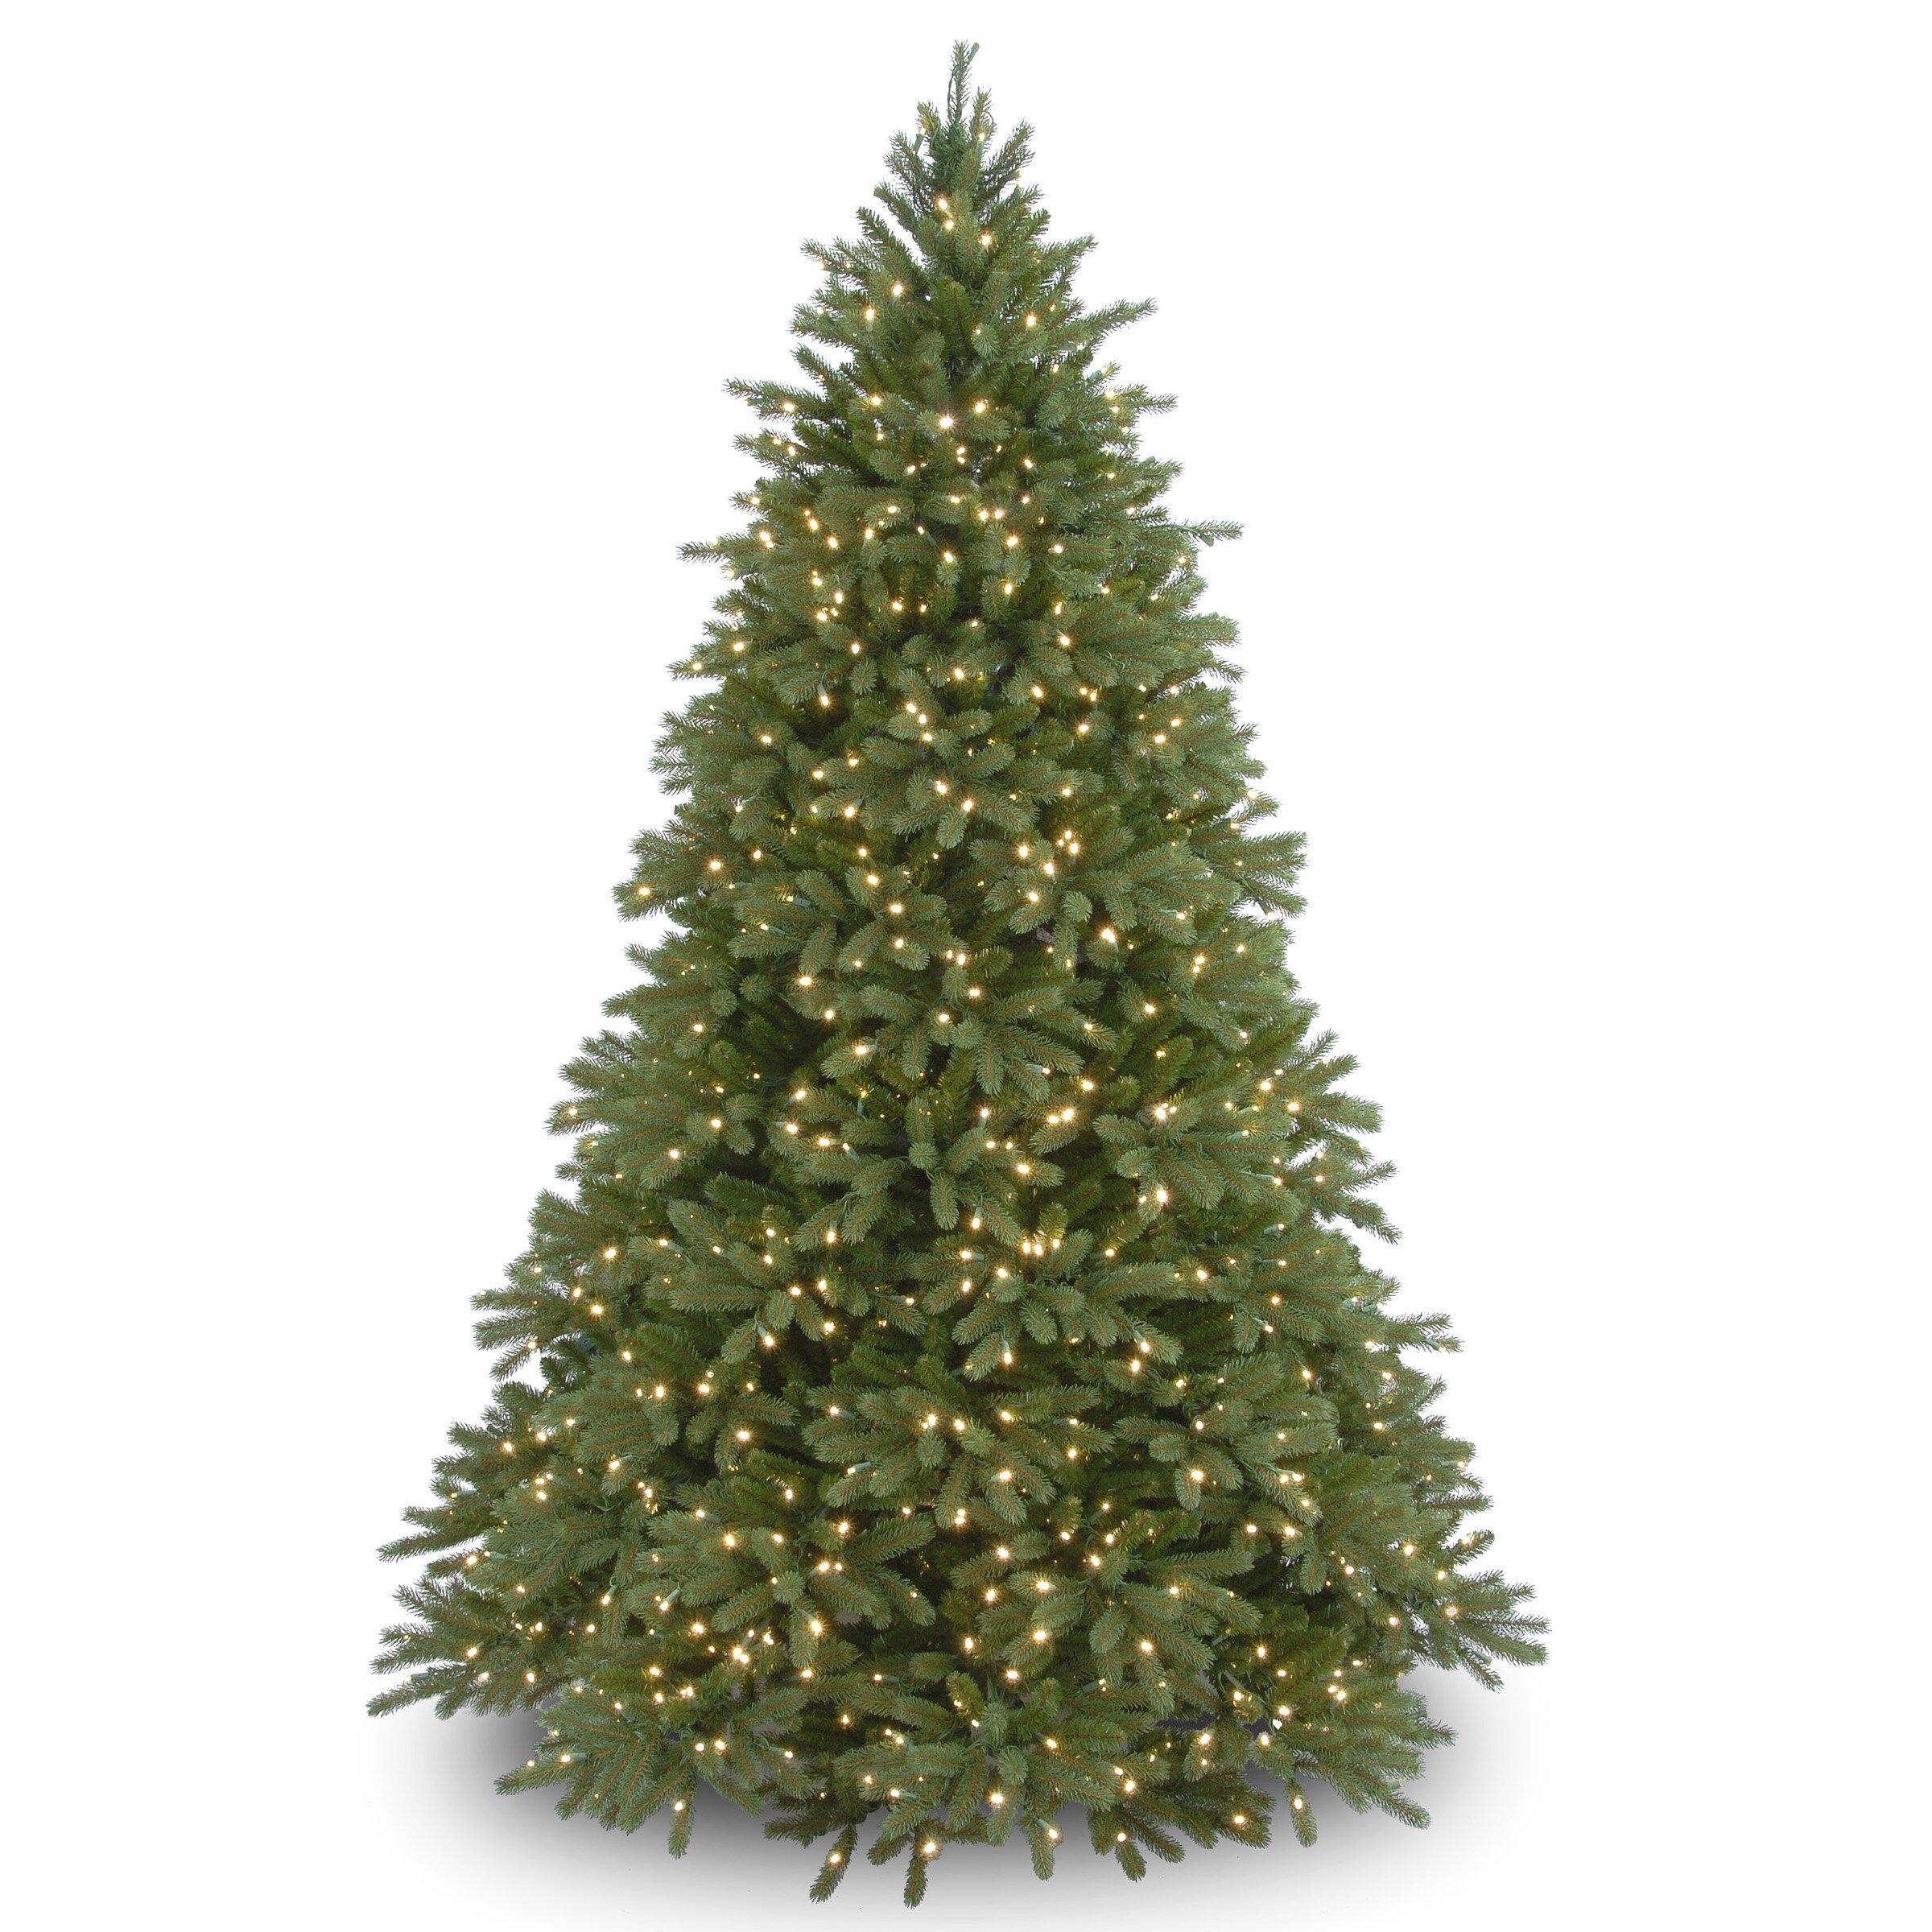 Fraser Fir Christmas Trees: The Holiday Aisle 7.5' Green Artificial Christmas Tree